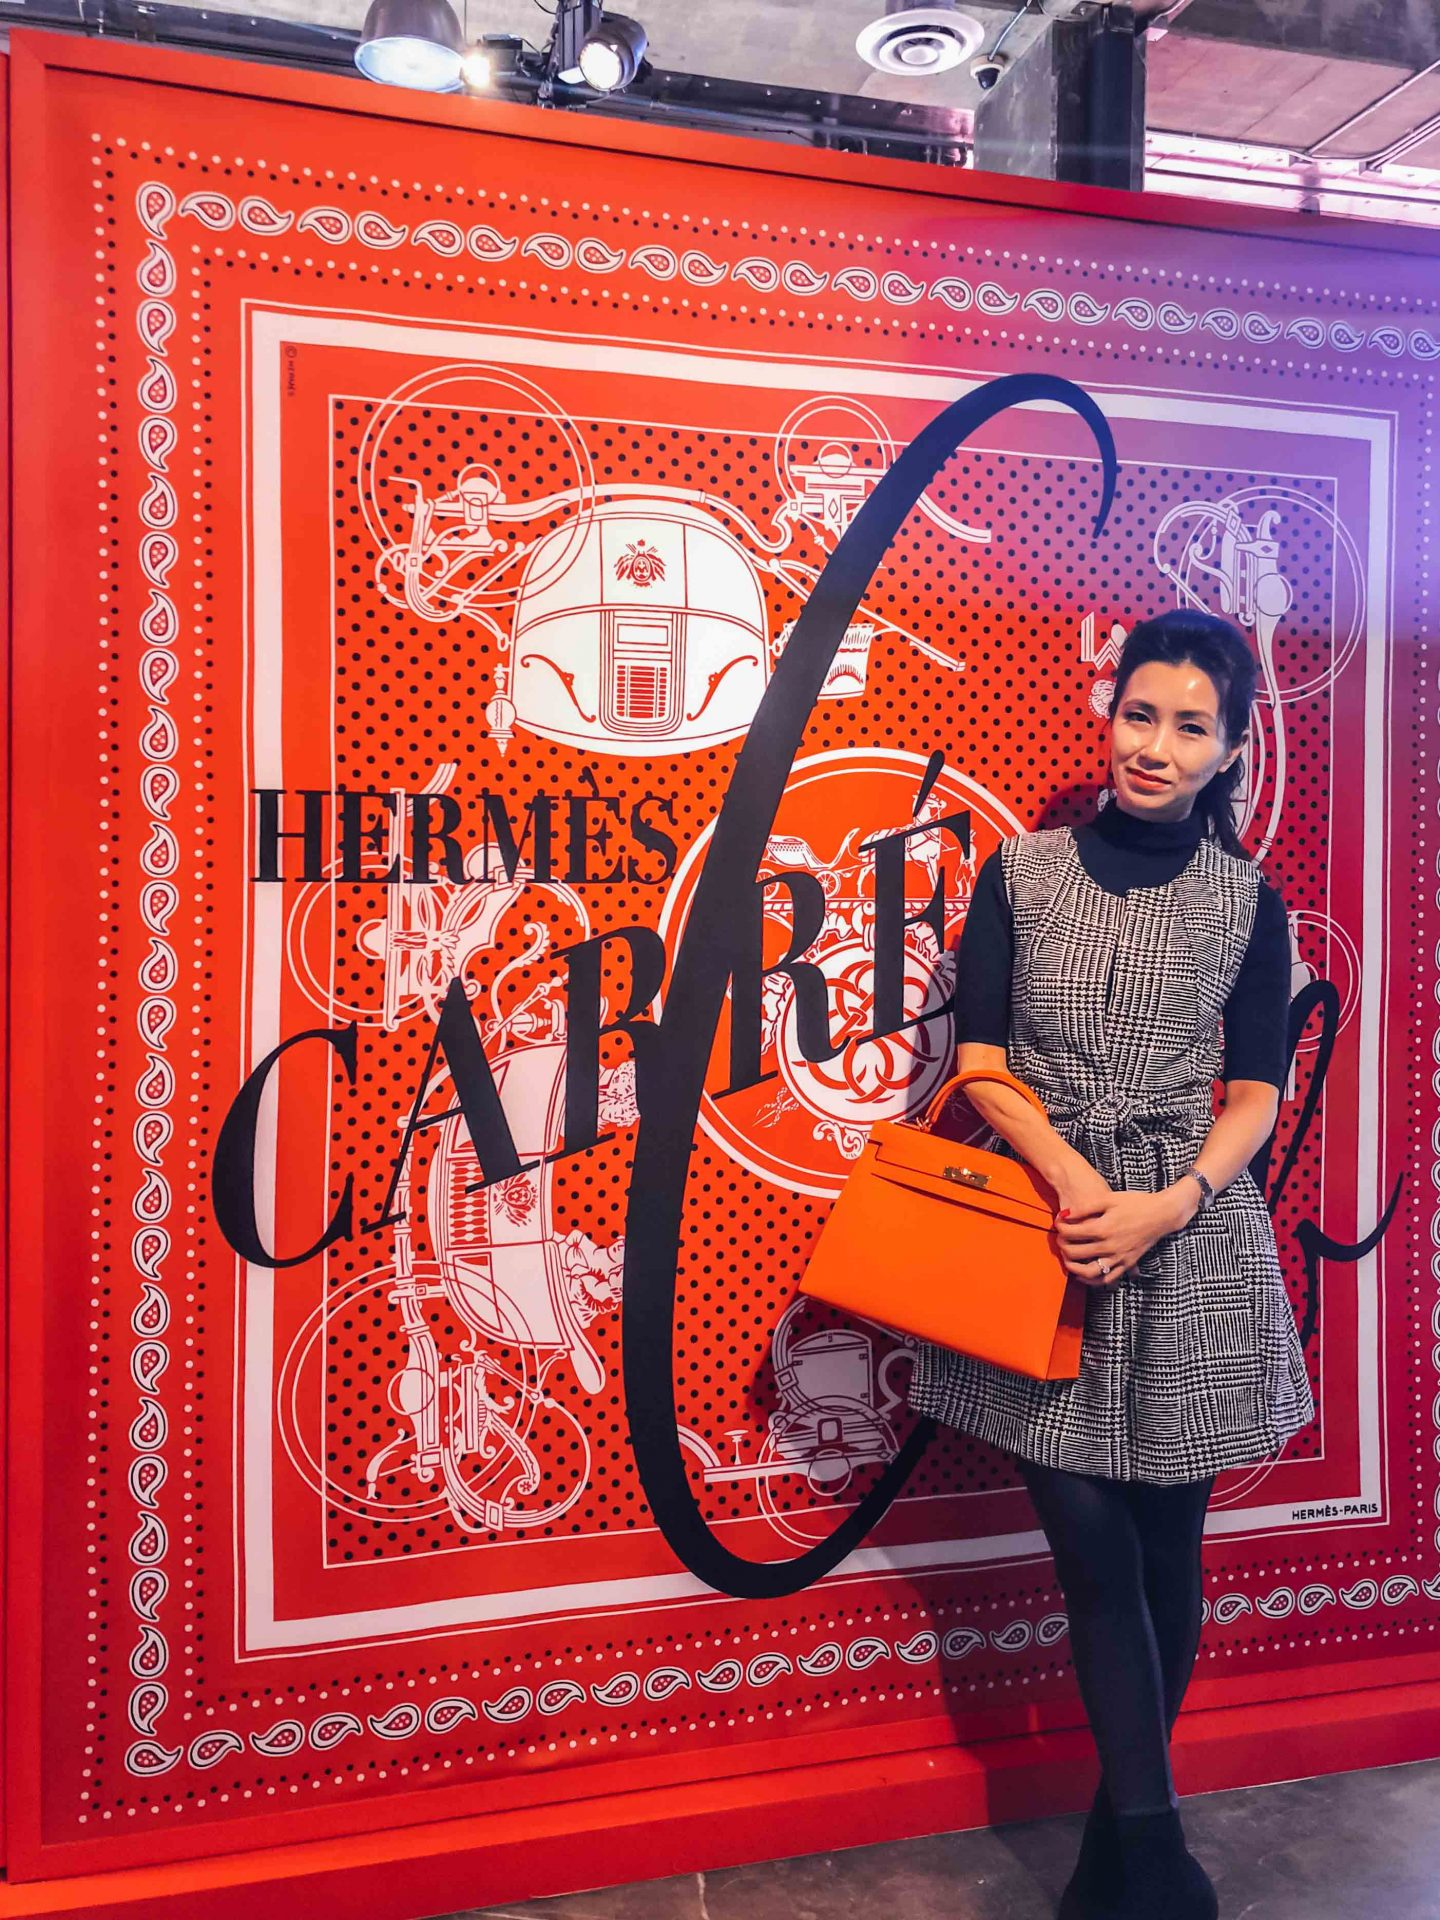 Los Angeles: Inside Look of Hermès Carré Club Pop Up